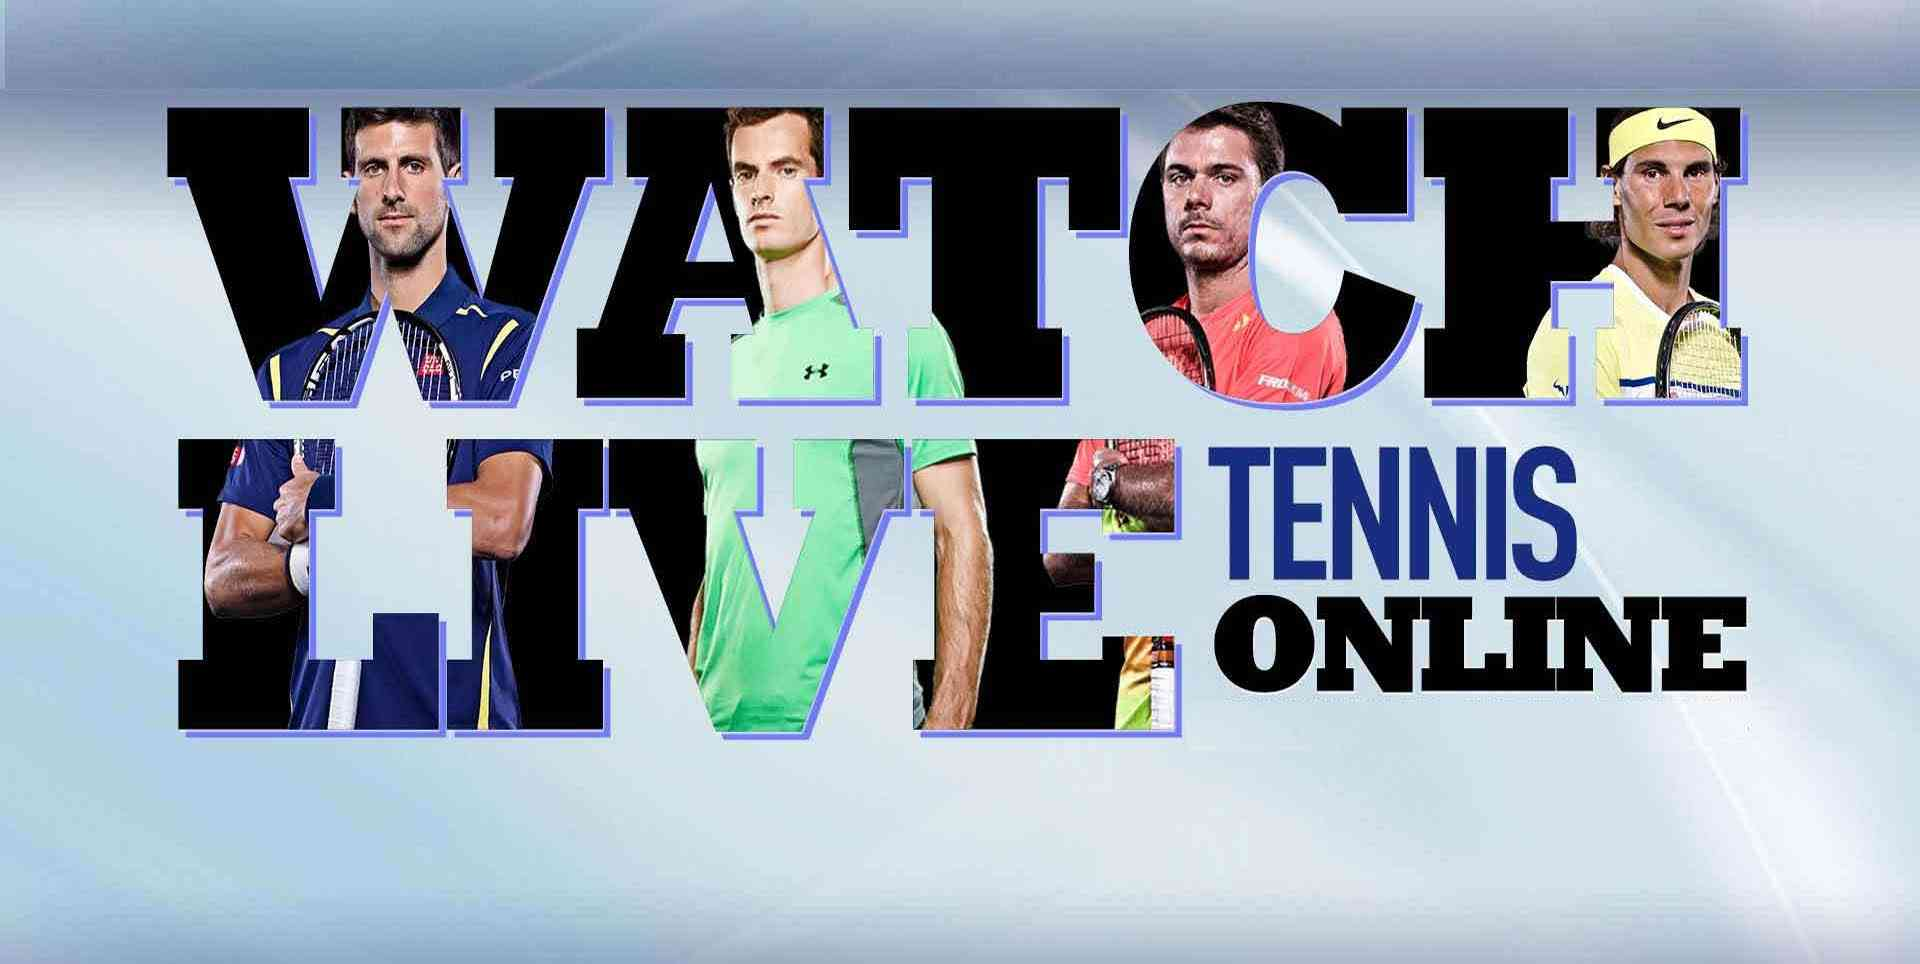 Watch A. Peya | B. Soares vs D. Marrero | F. Verdasco Quarterfinals Online 2013